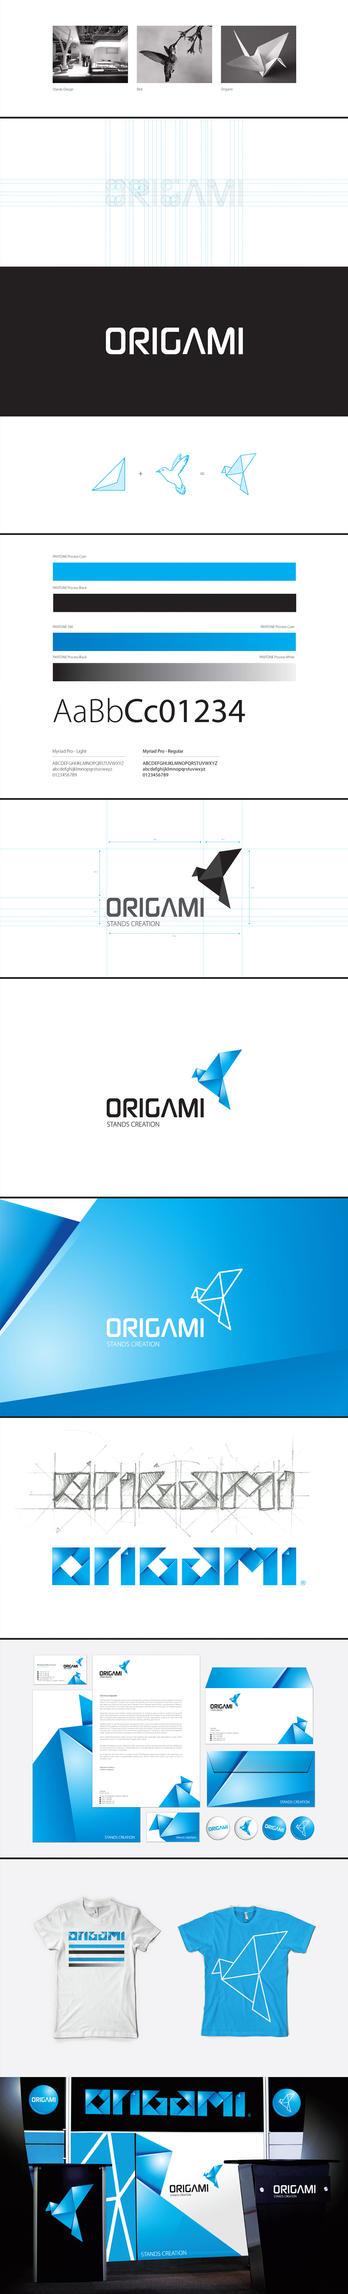 Origami Identity by BACEL